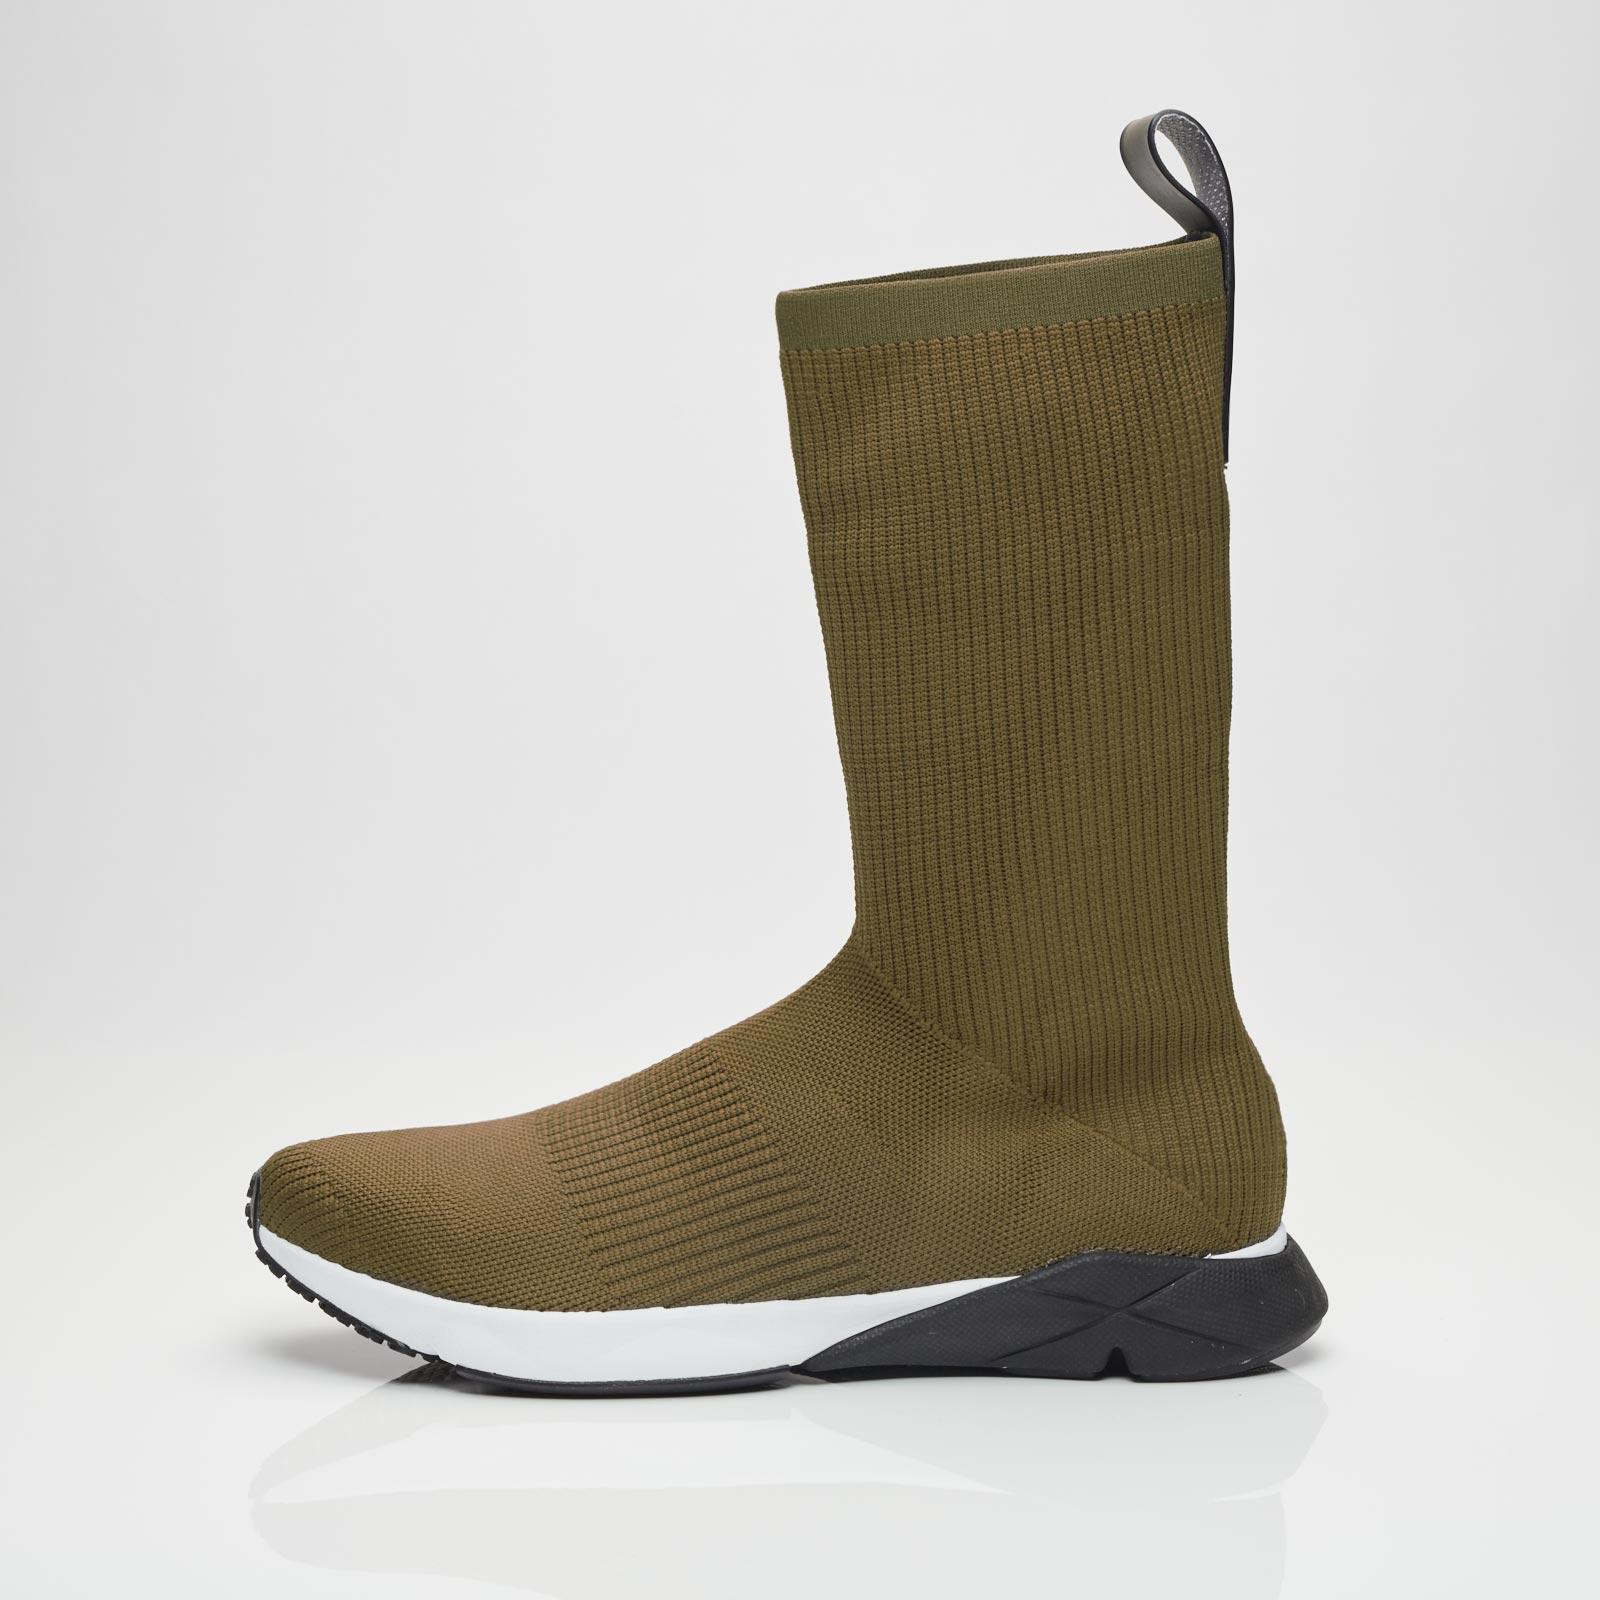 cfd7c0a8bdfa Reebok Sock Runner - Cn0085 - Sneakersnstuff